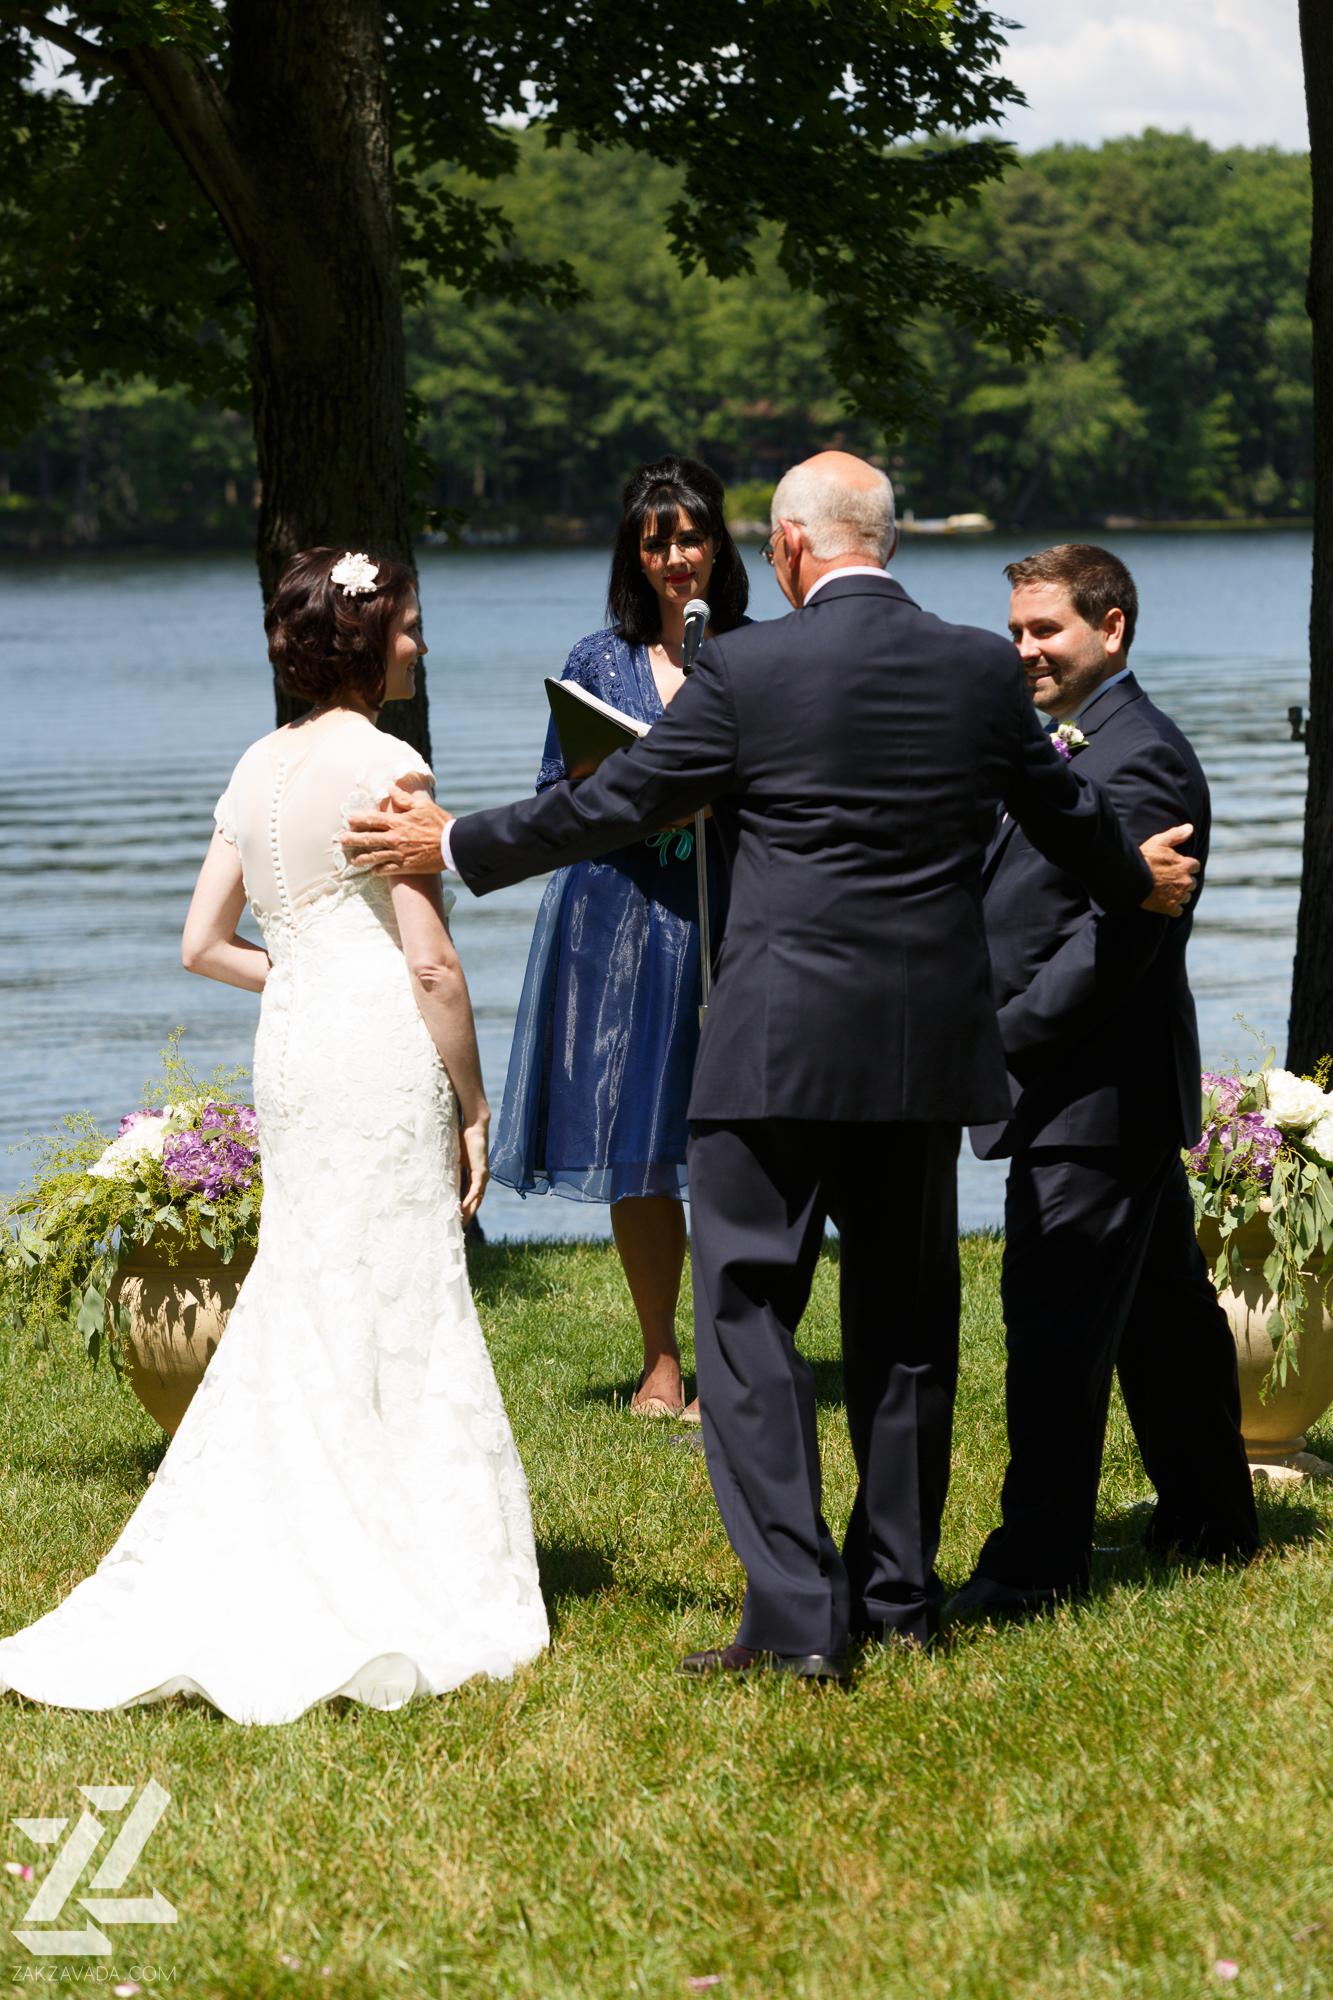 scranton-wedding-photography-zak-zavada-ruddyBelcastroWedding-188.jpg